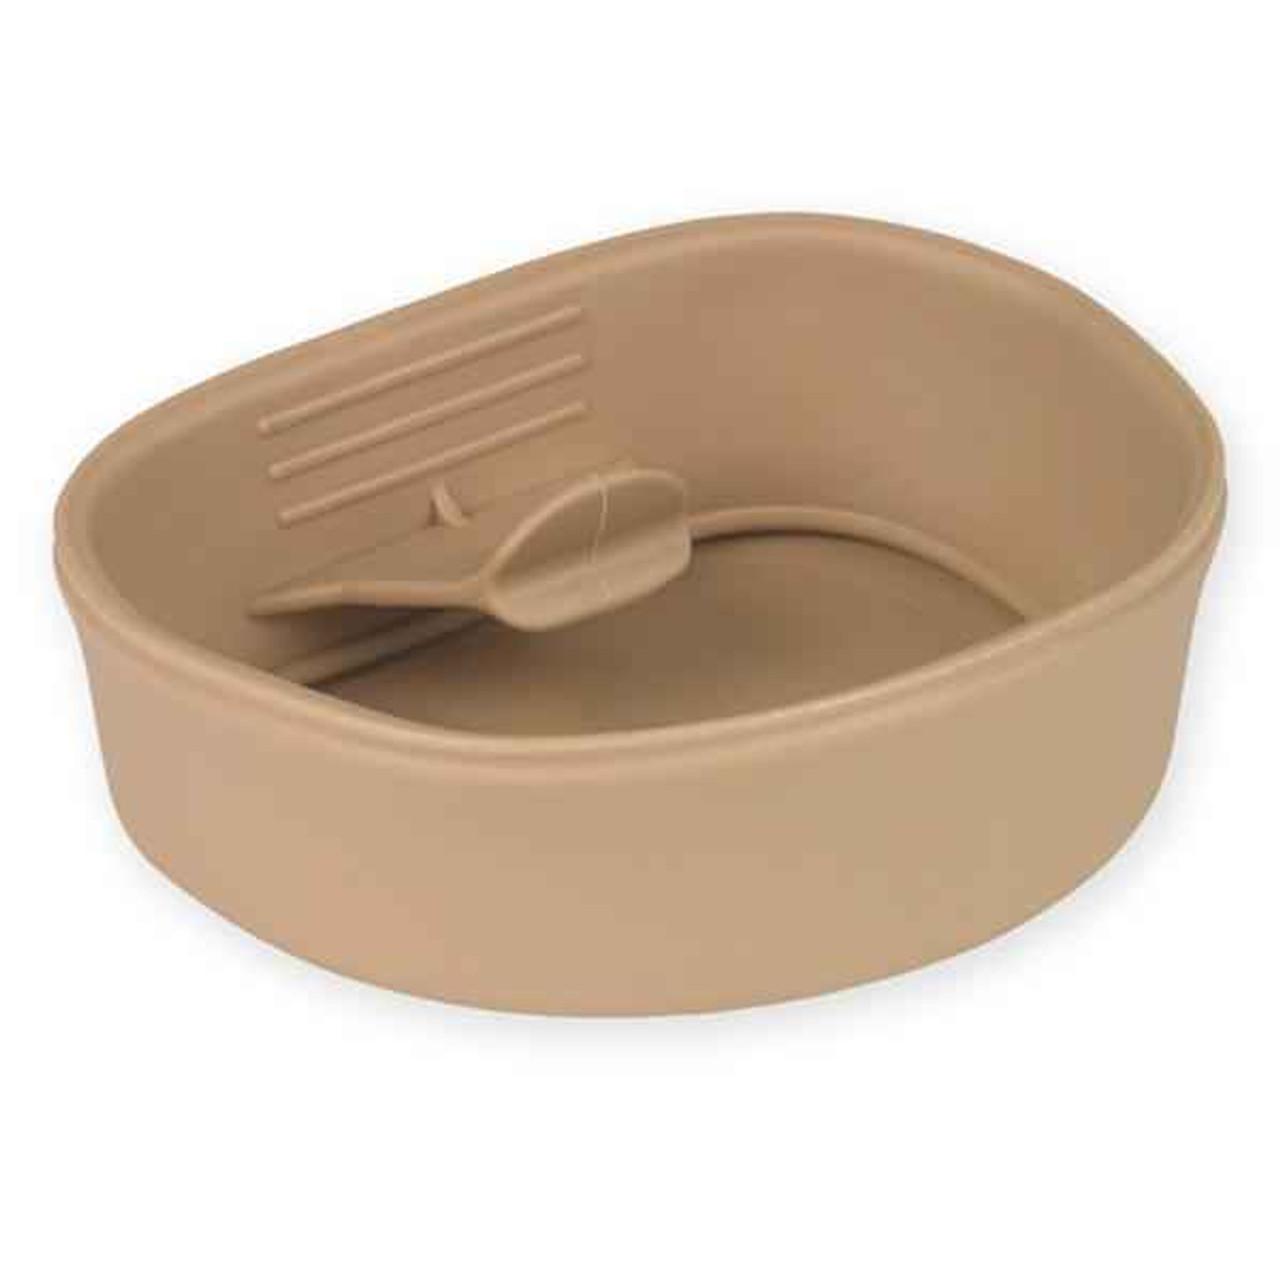 Wildo Fold-a-cup, Small, Tan